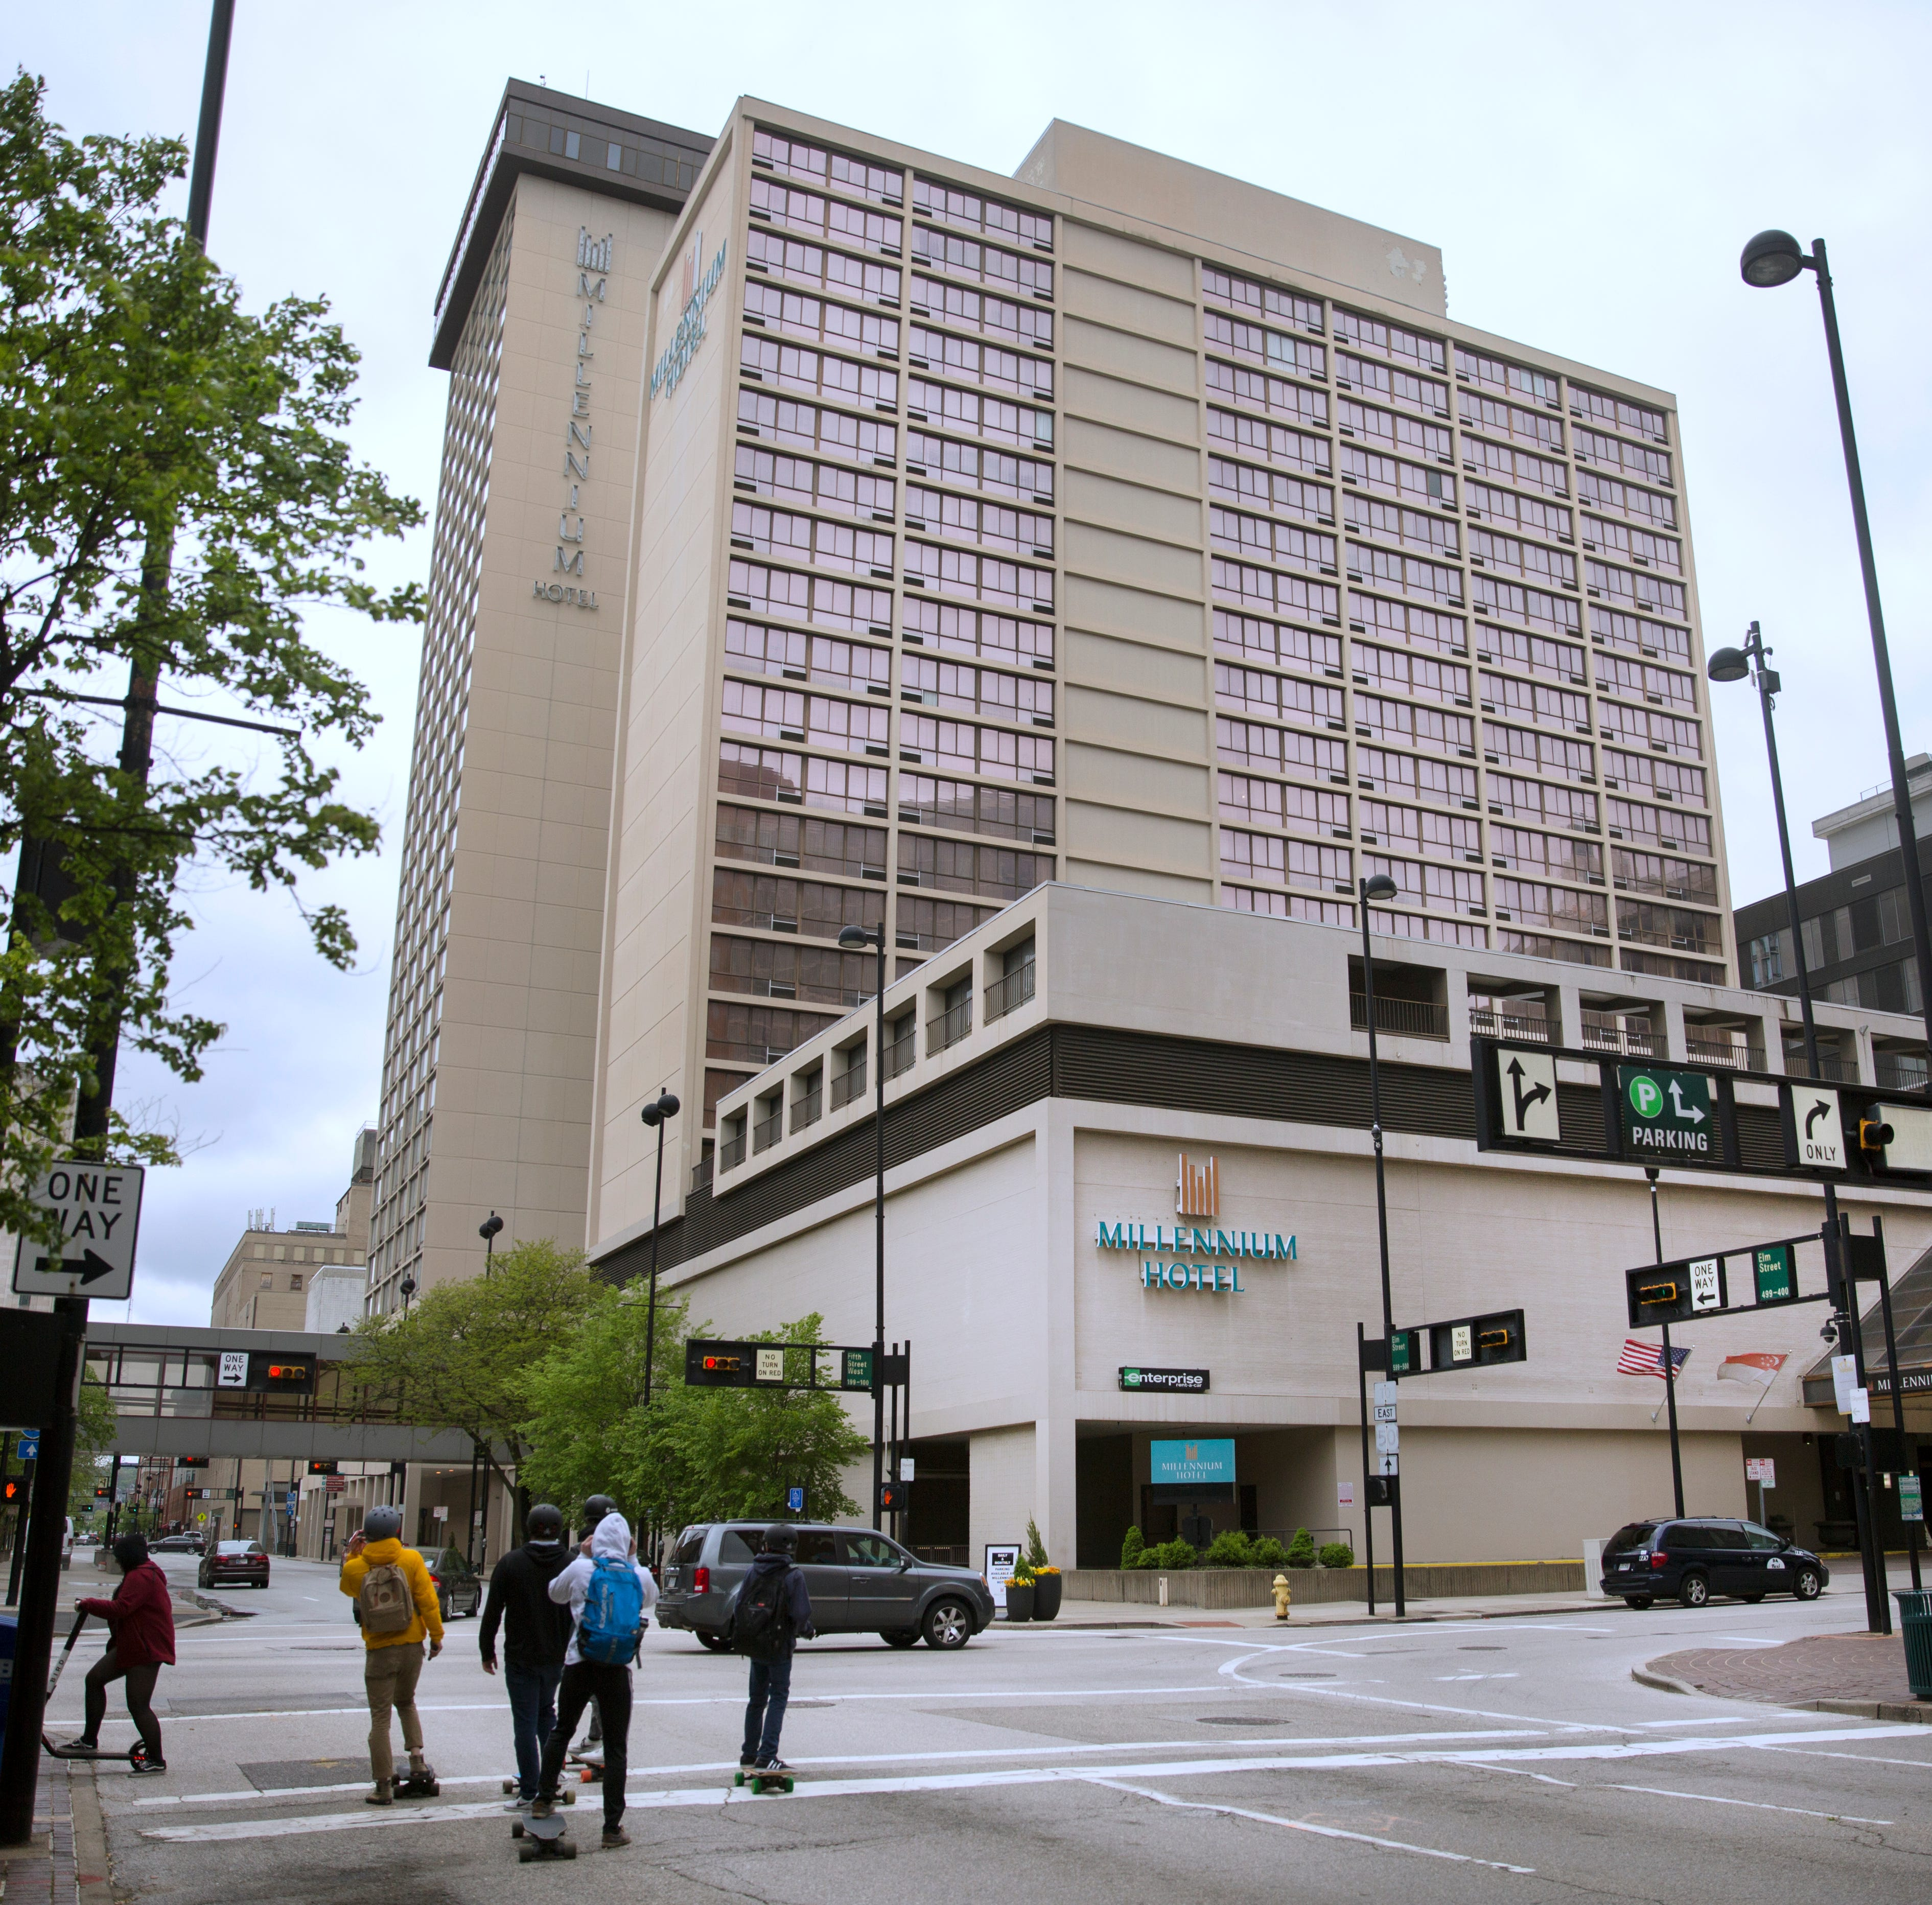 Millennium Hotel a victim of 'aggression,' accuses city of Cincinnati of smear campaign